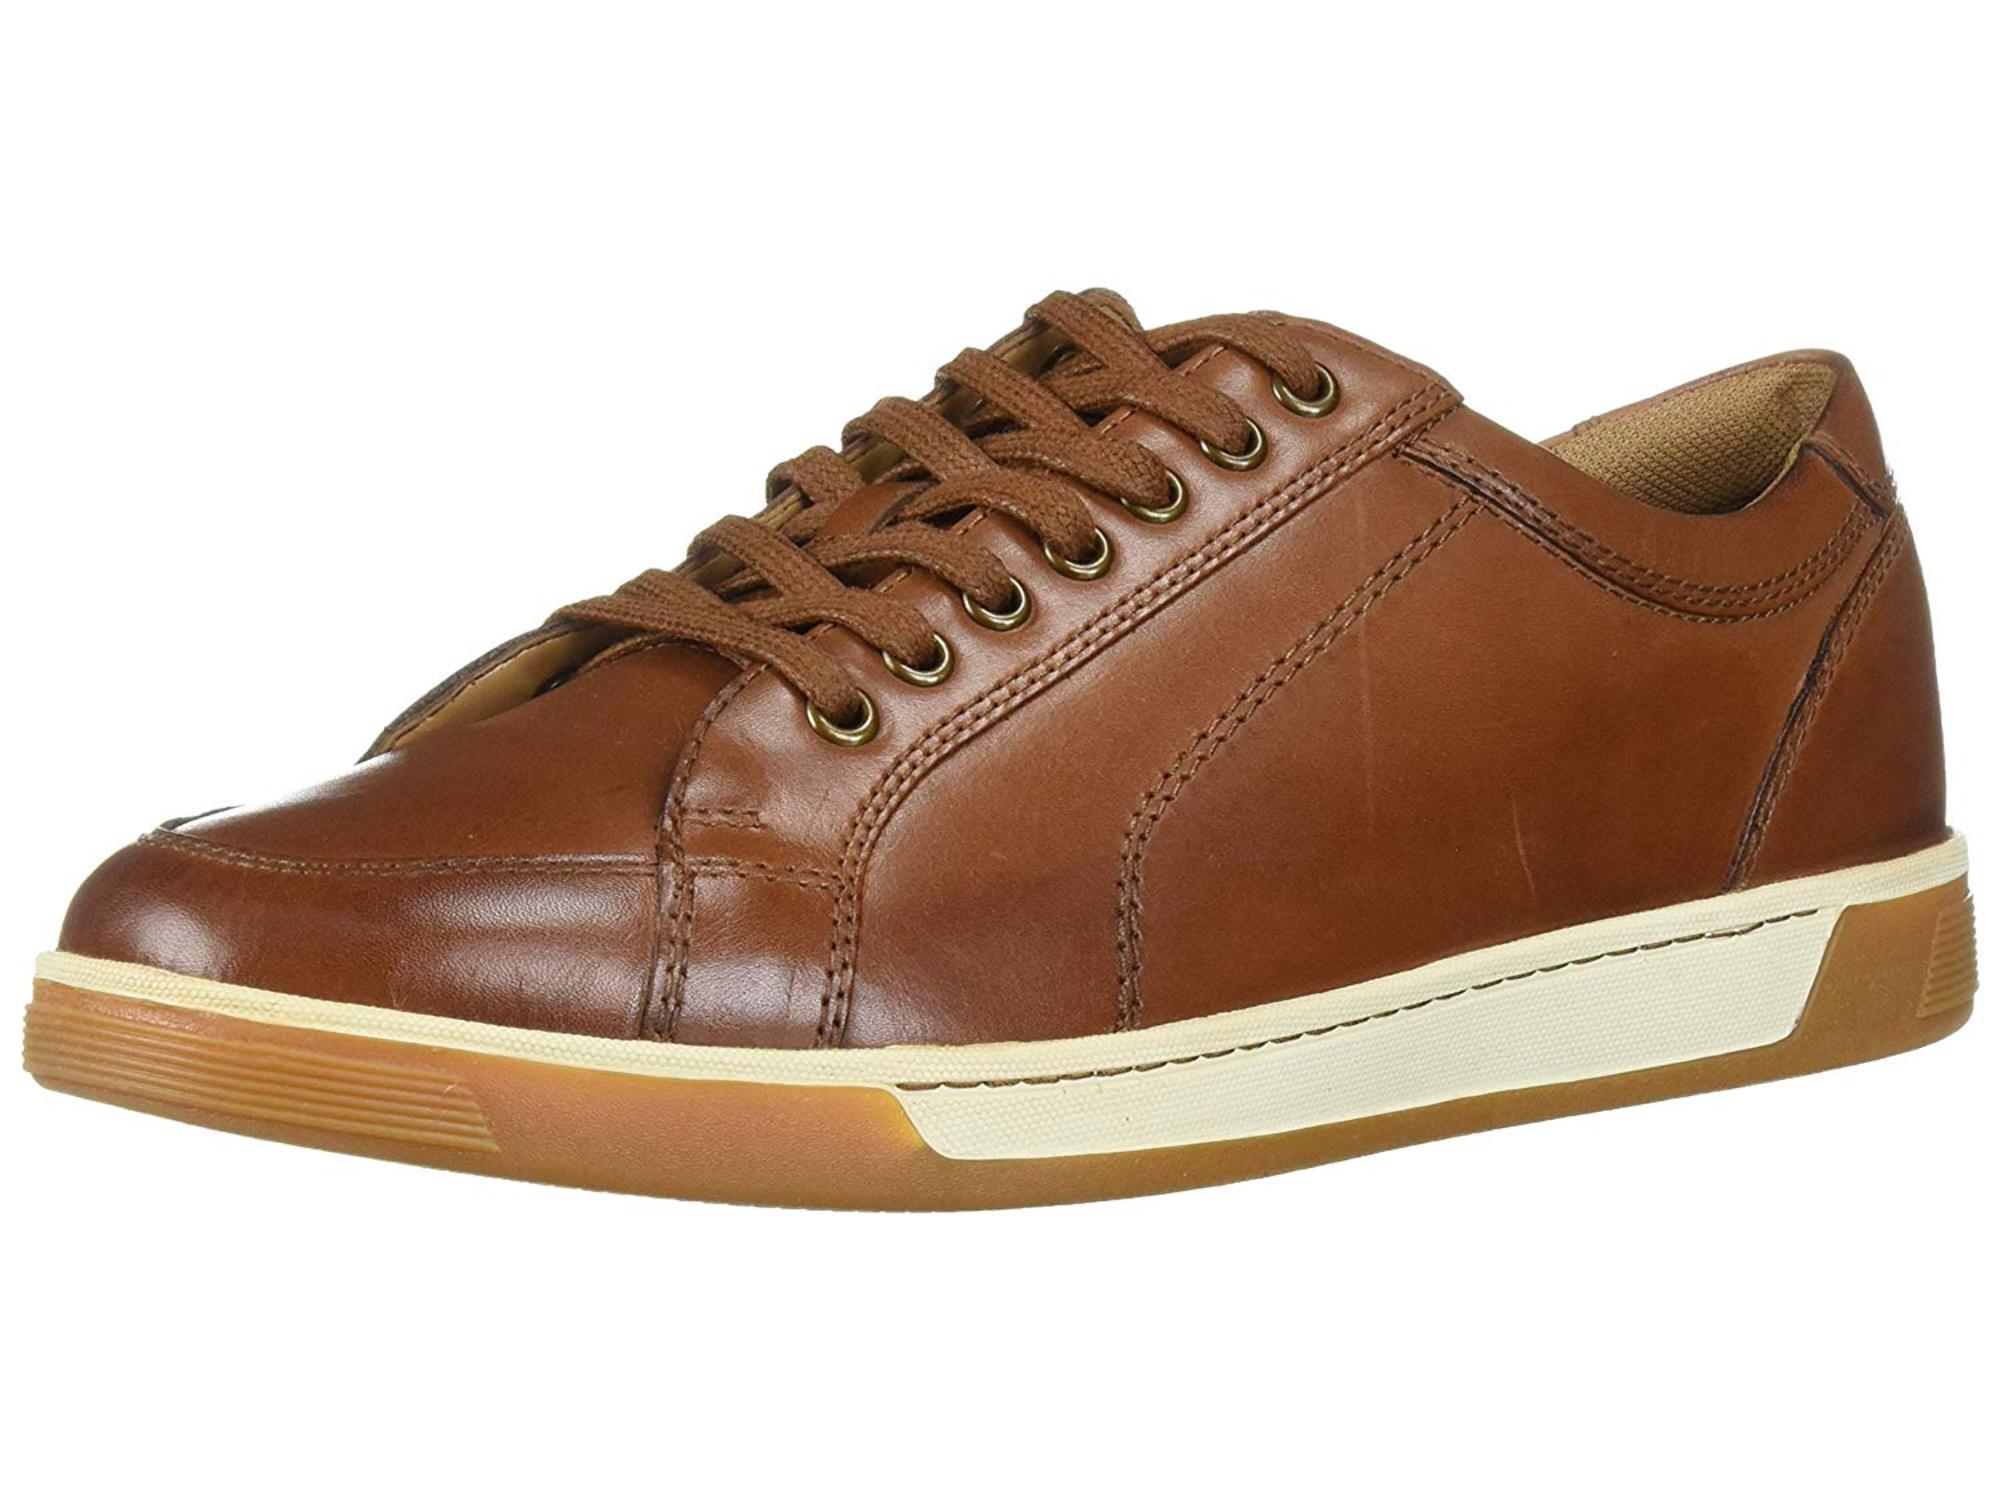 Berkley Sneaker, British Tan, Size 13.0